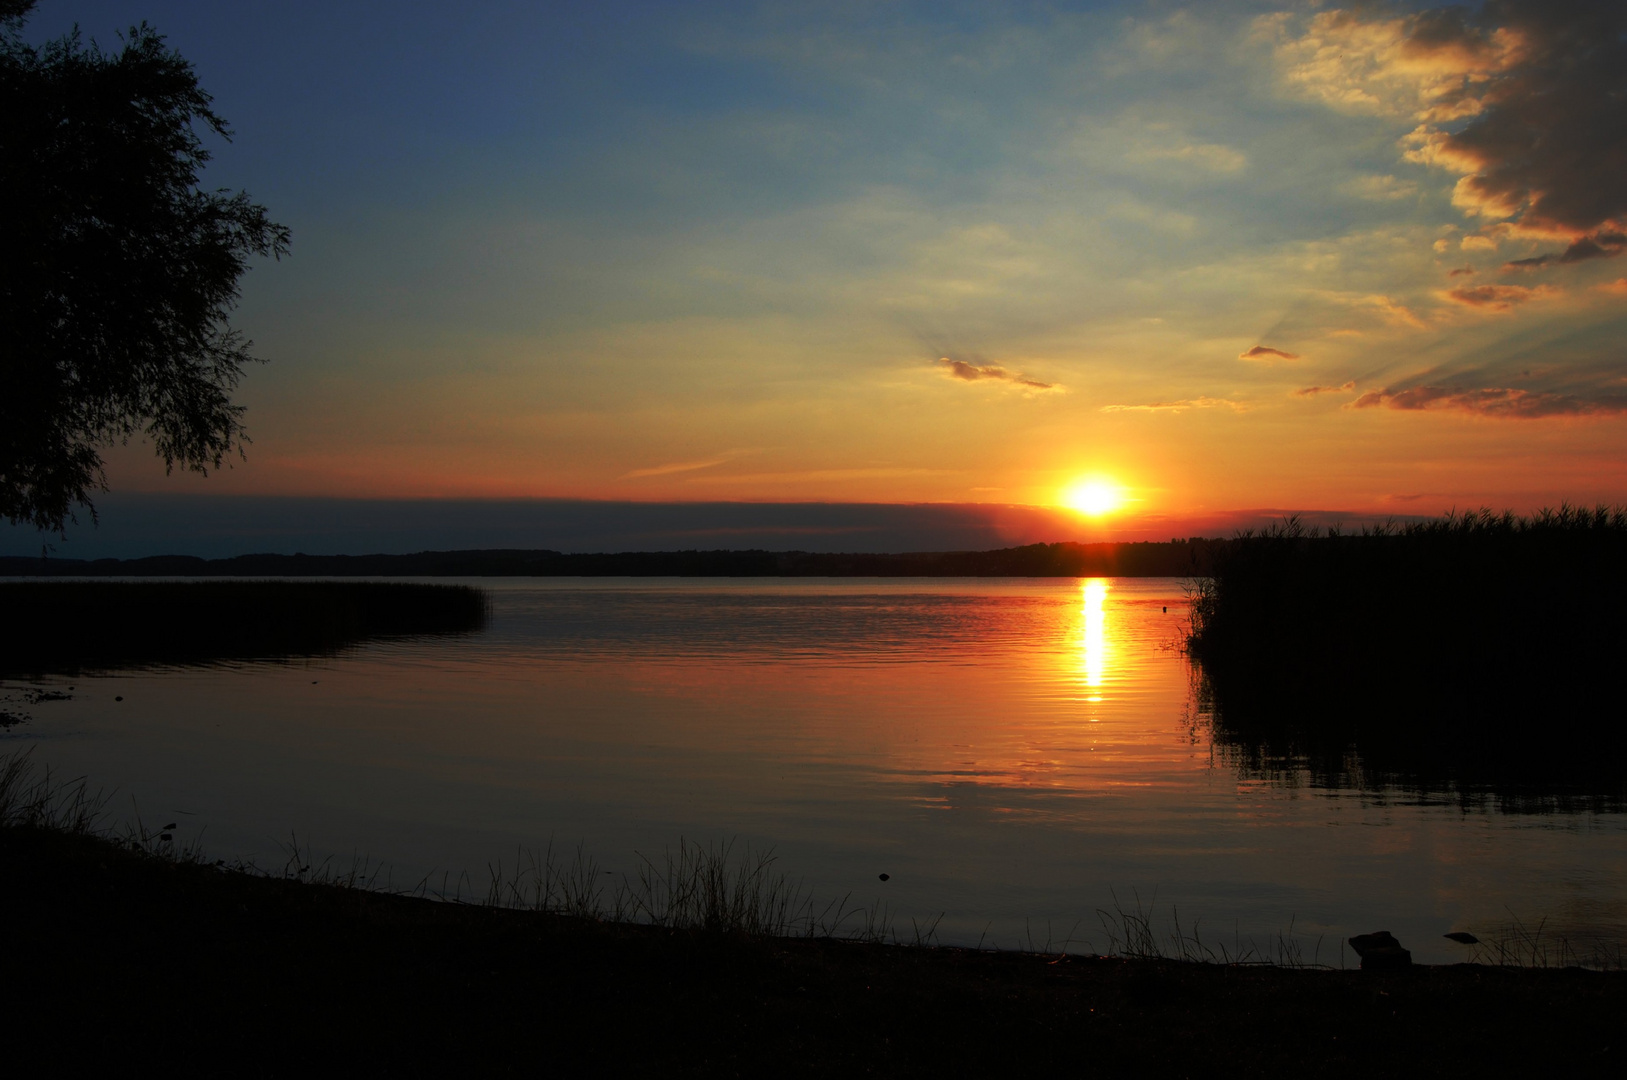 Sonnenuntergang am Tollensesee III